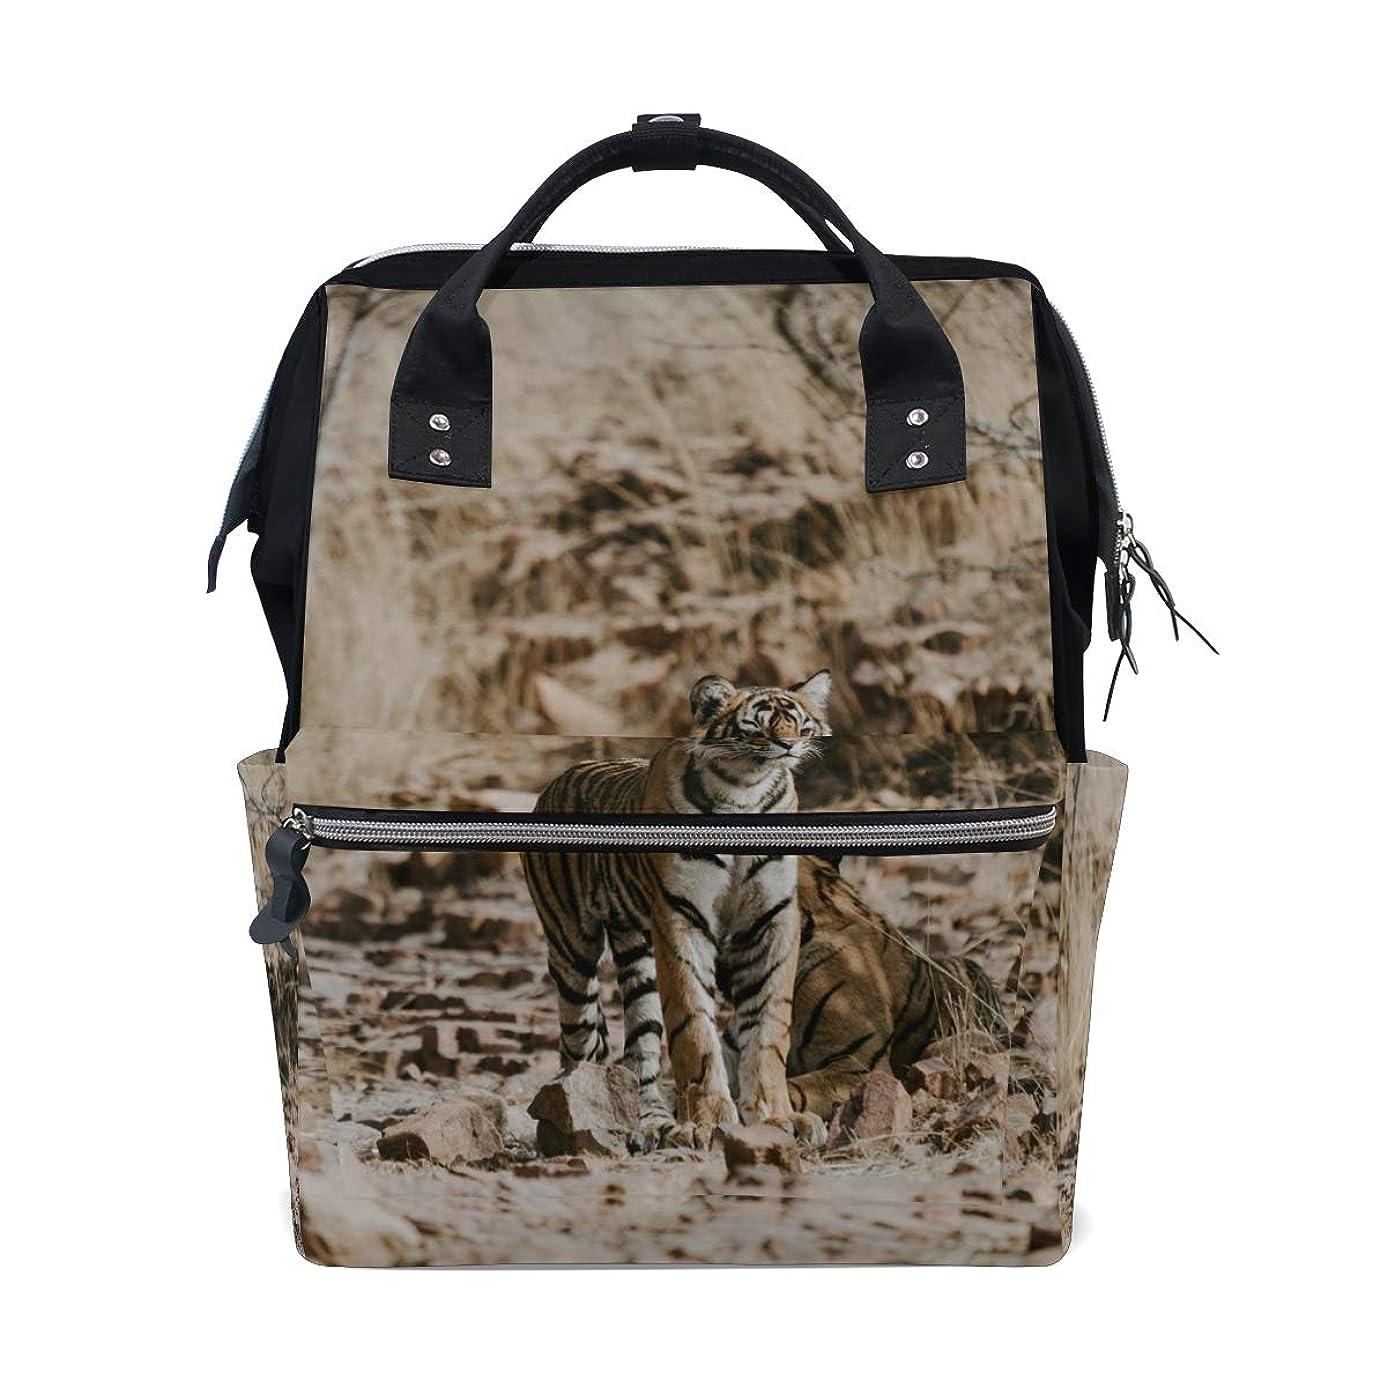 Backpack Vintage Animal Tiger School Rucksack Diaper Bags Travel Shoulder Large Capacity Bookbag for Women Men